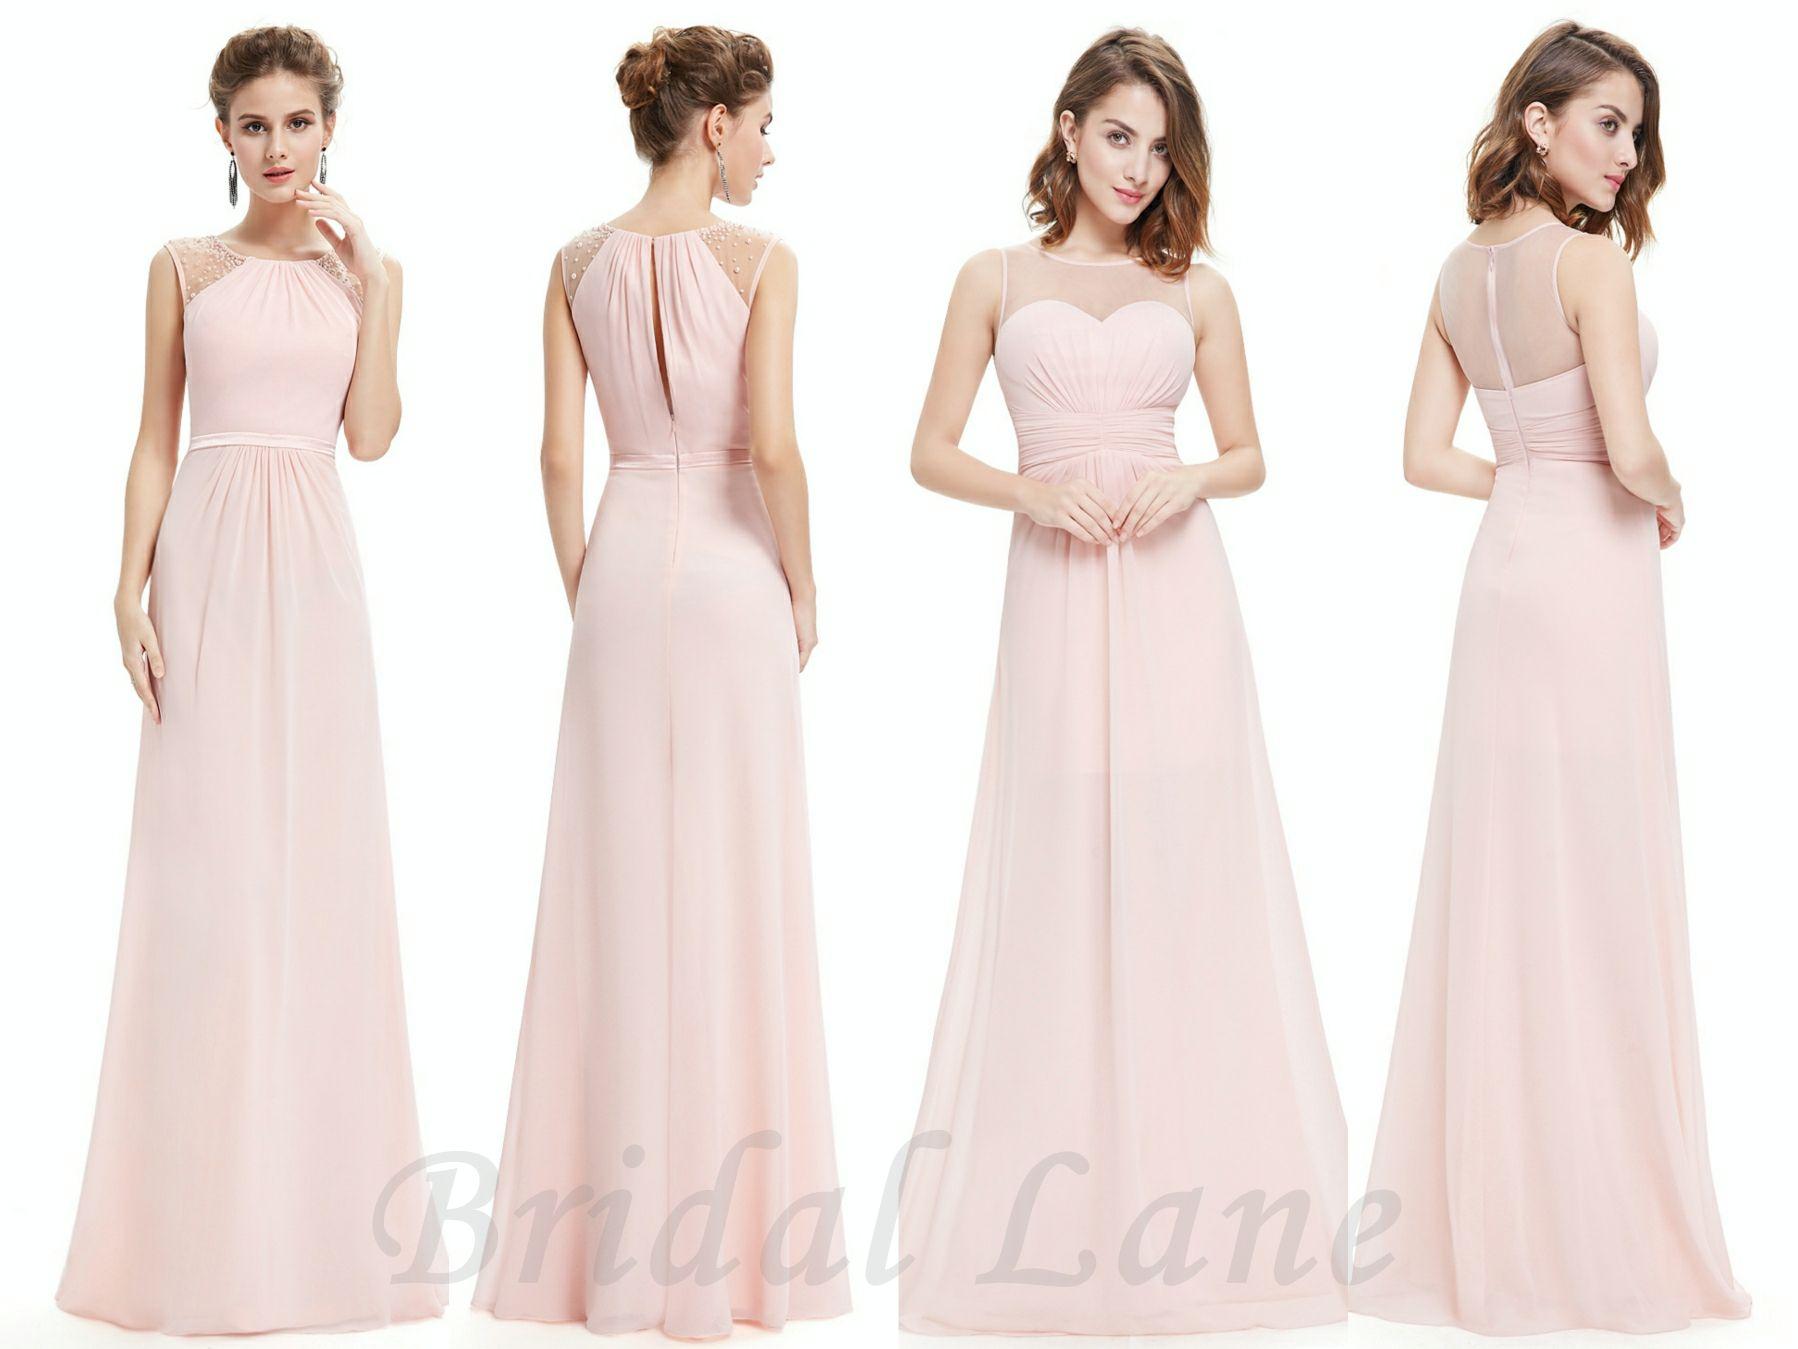 Medium Crop Of Blush Pink Bridesmaid Dresses